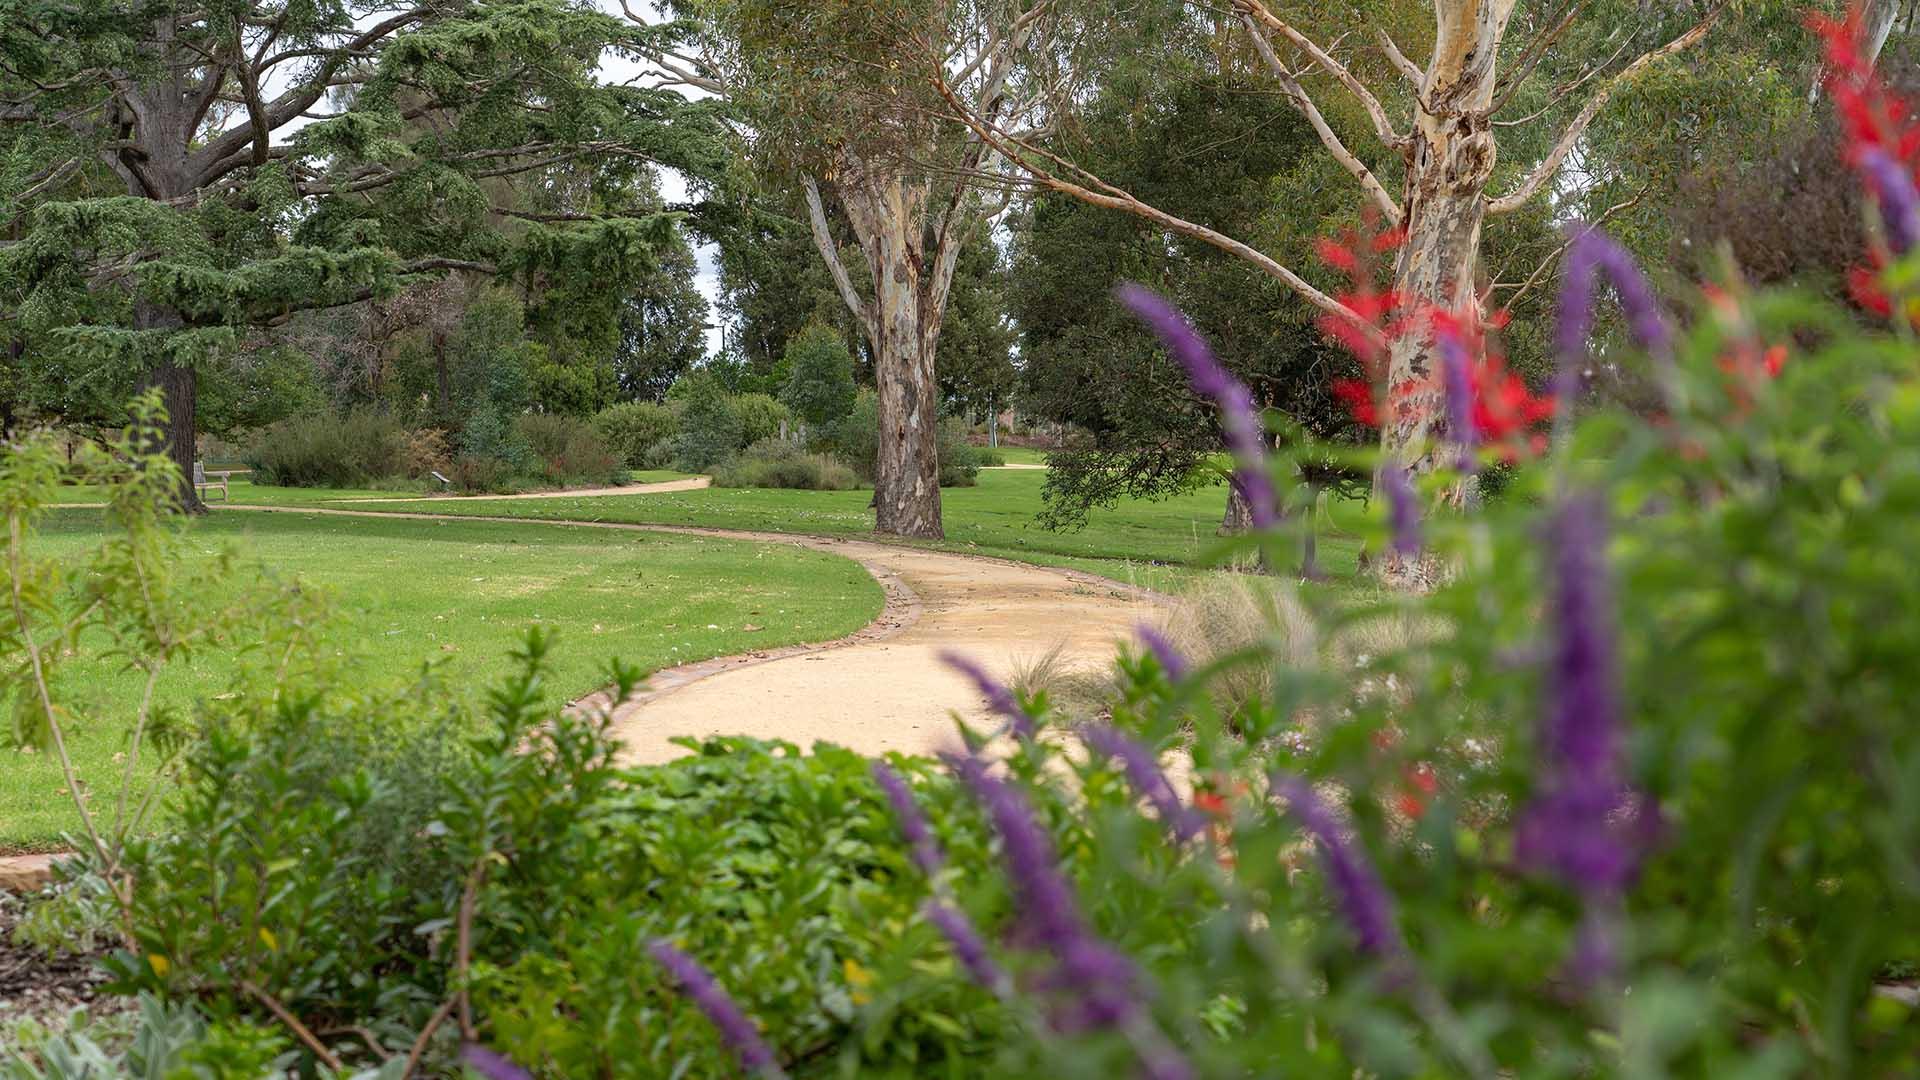 Sale Botanic Gardens path with flowers.